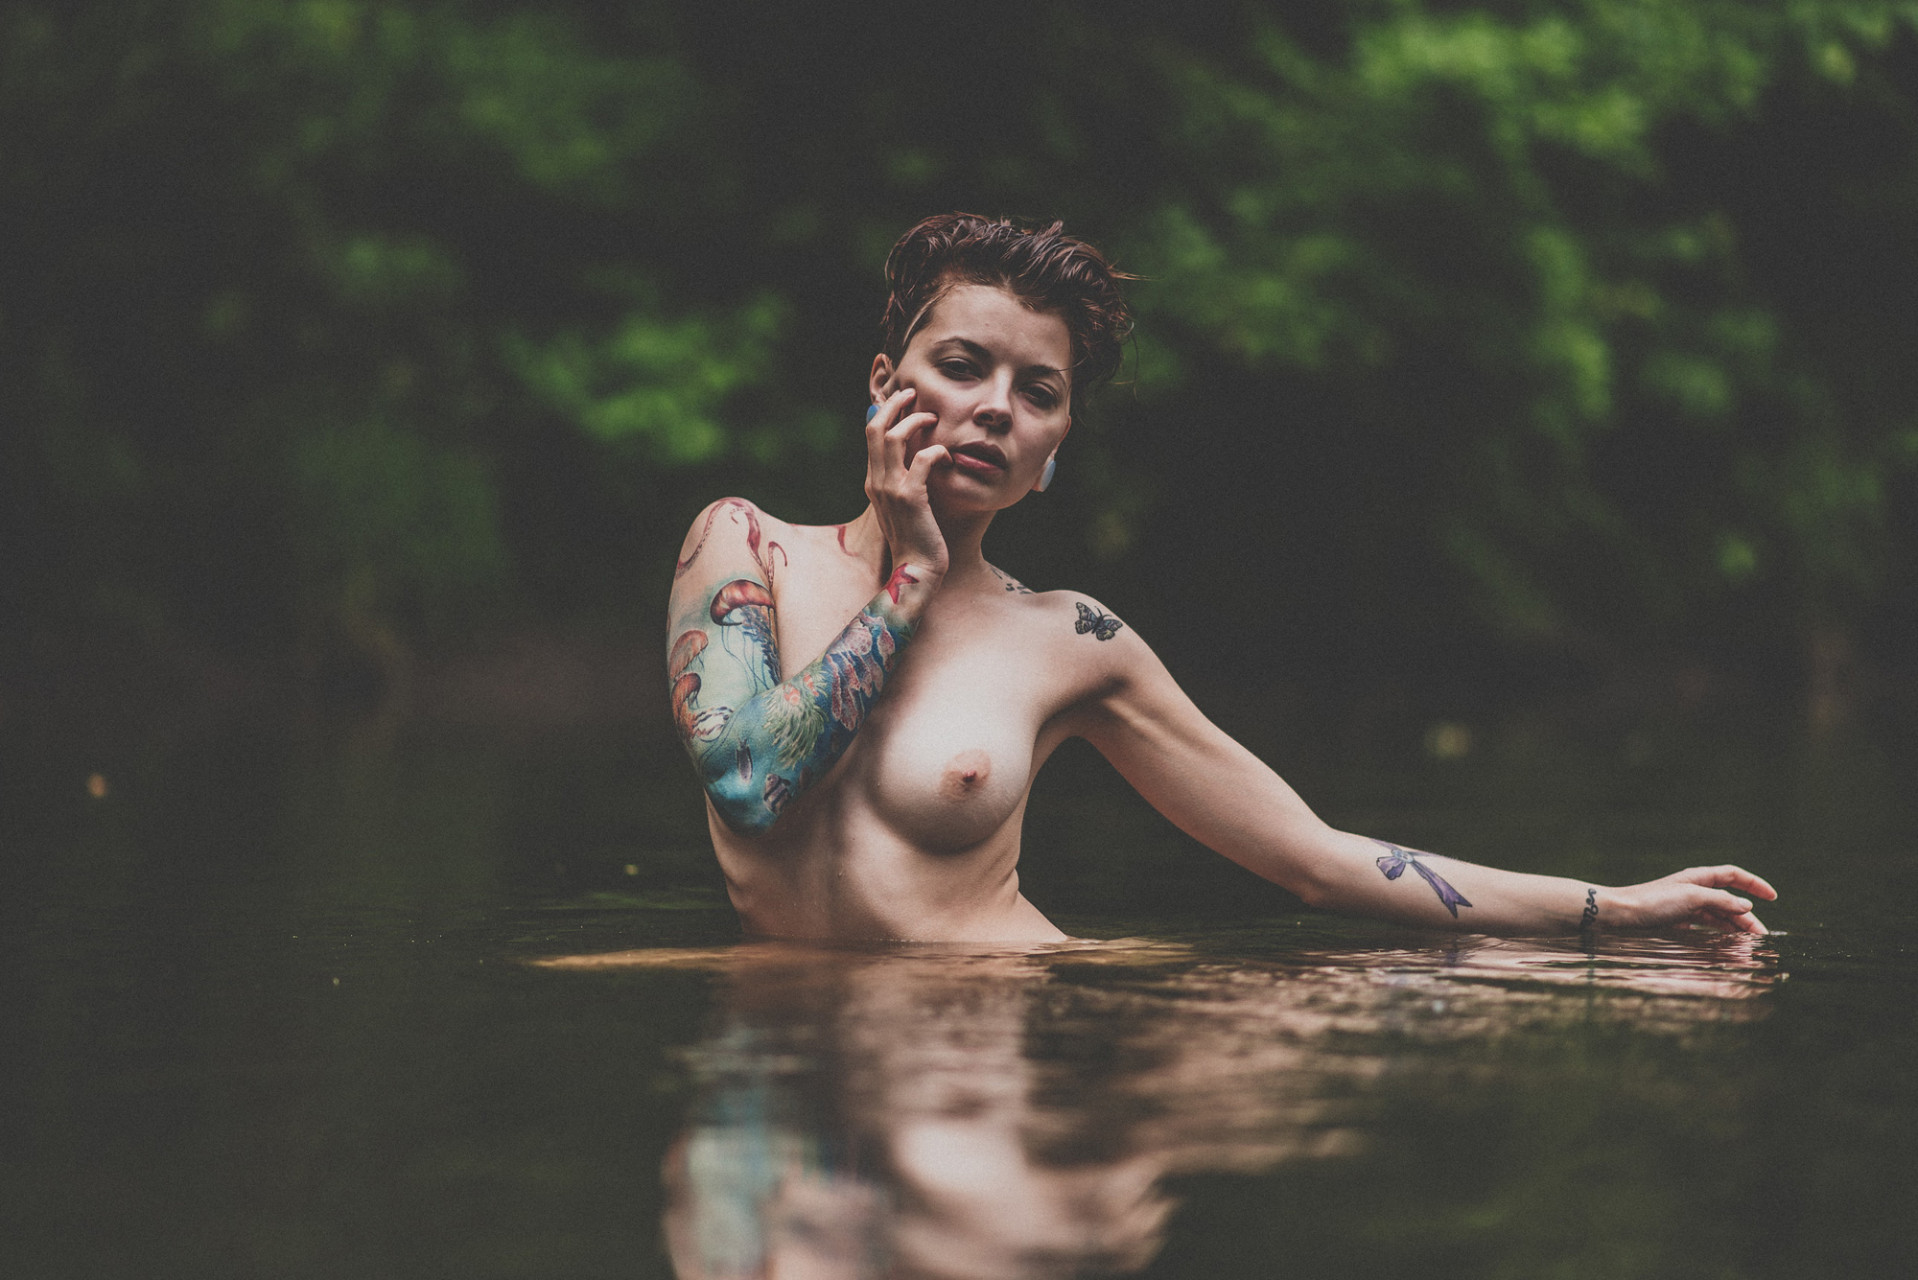 BeckyNature_011